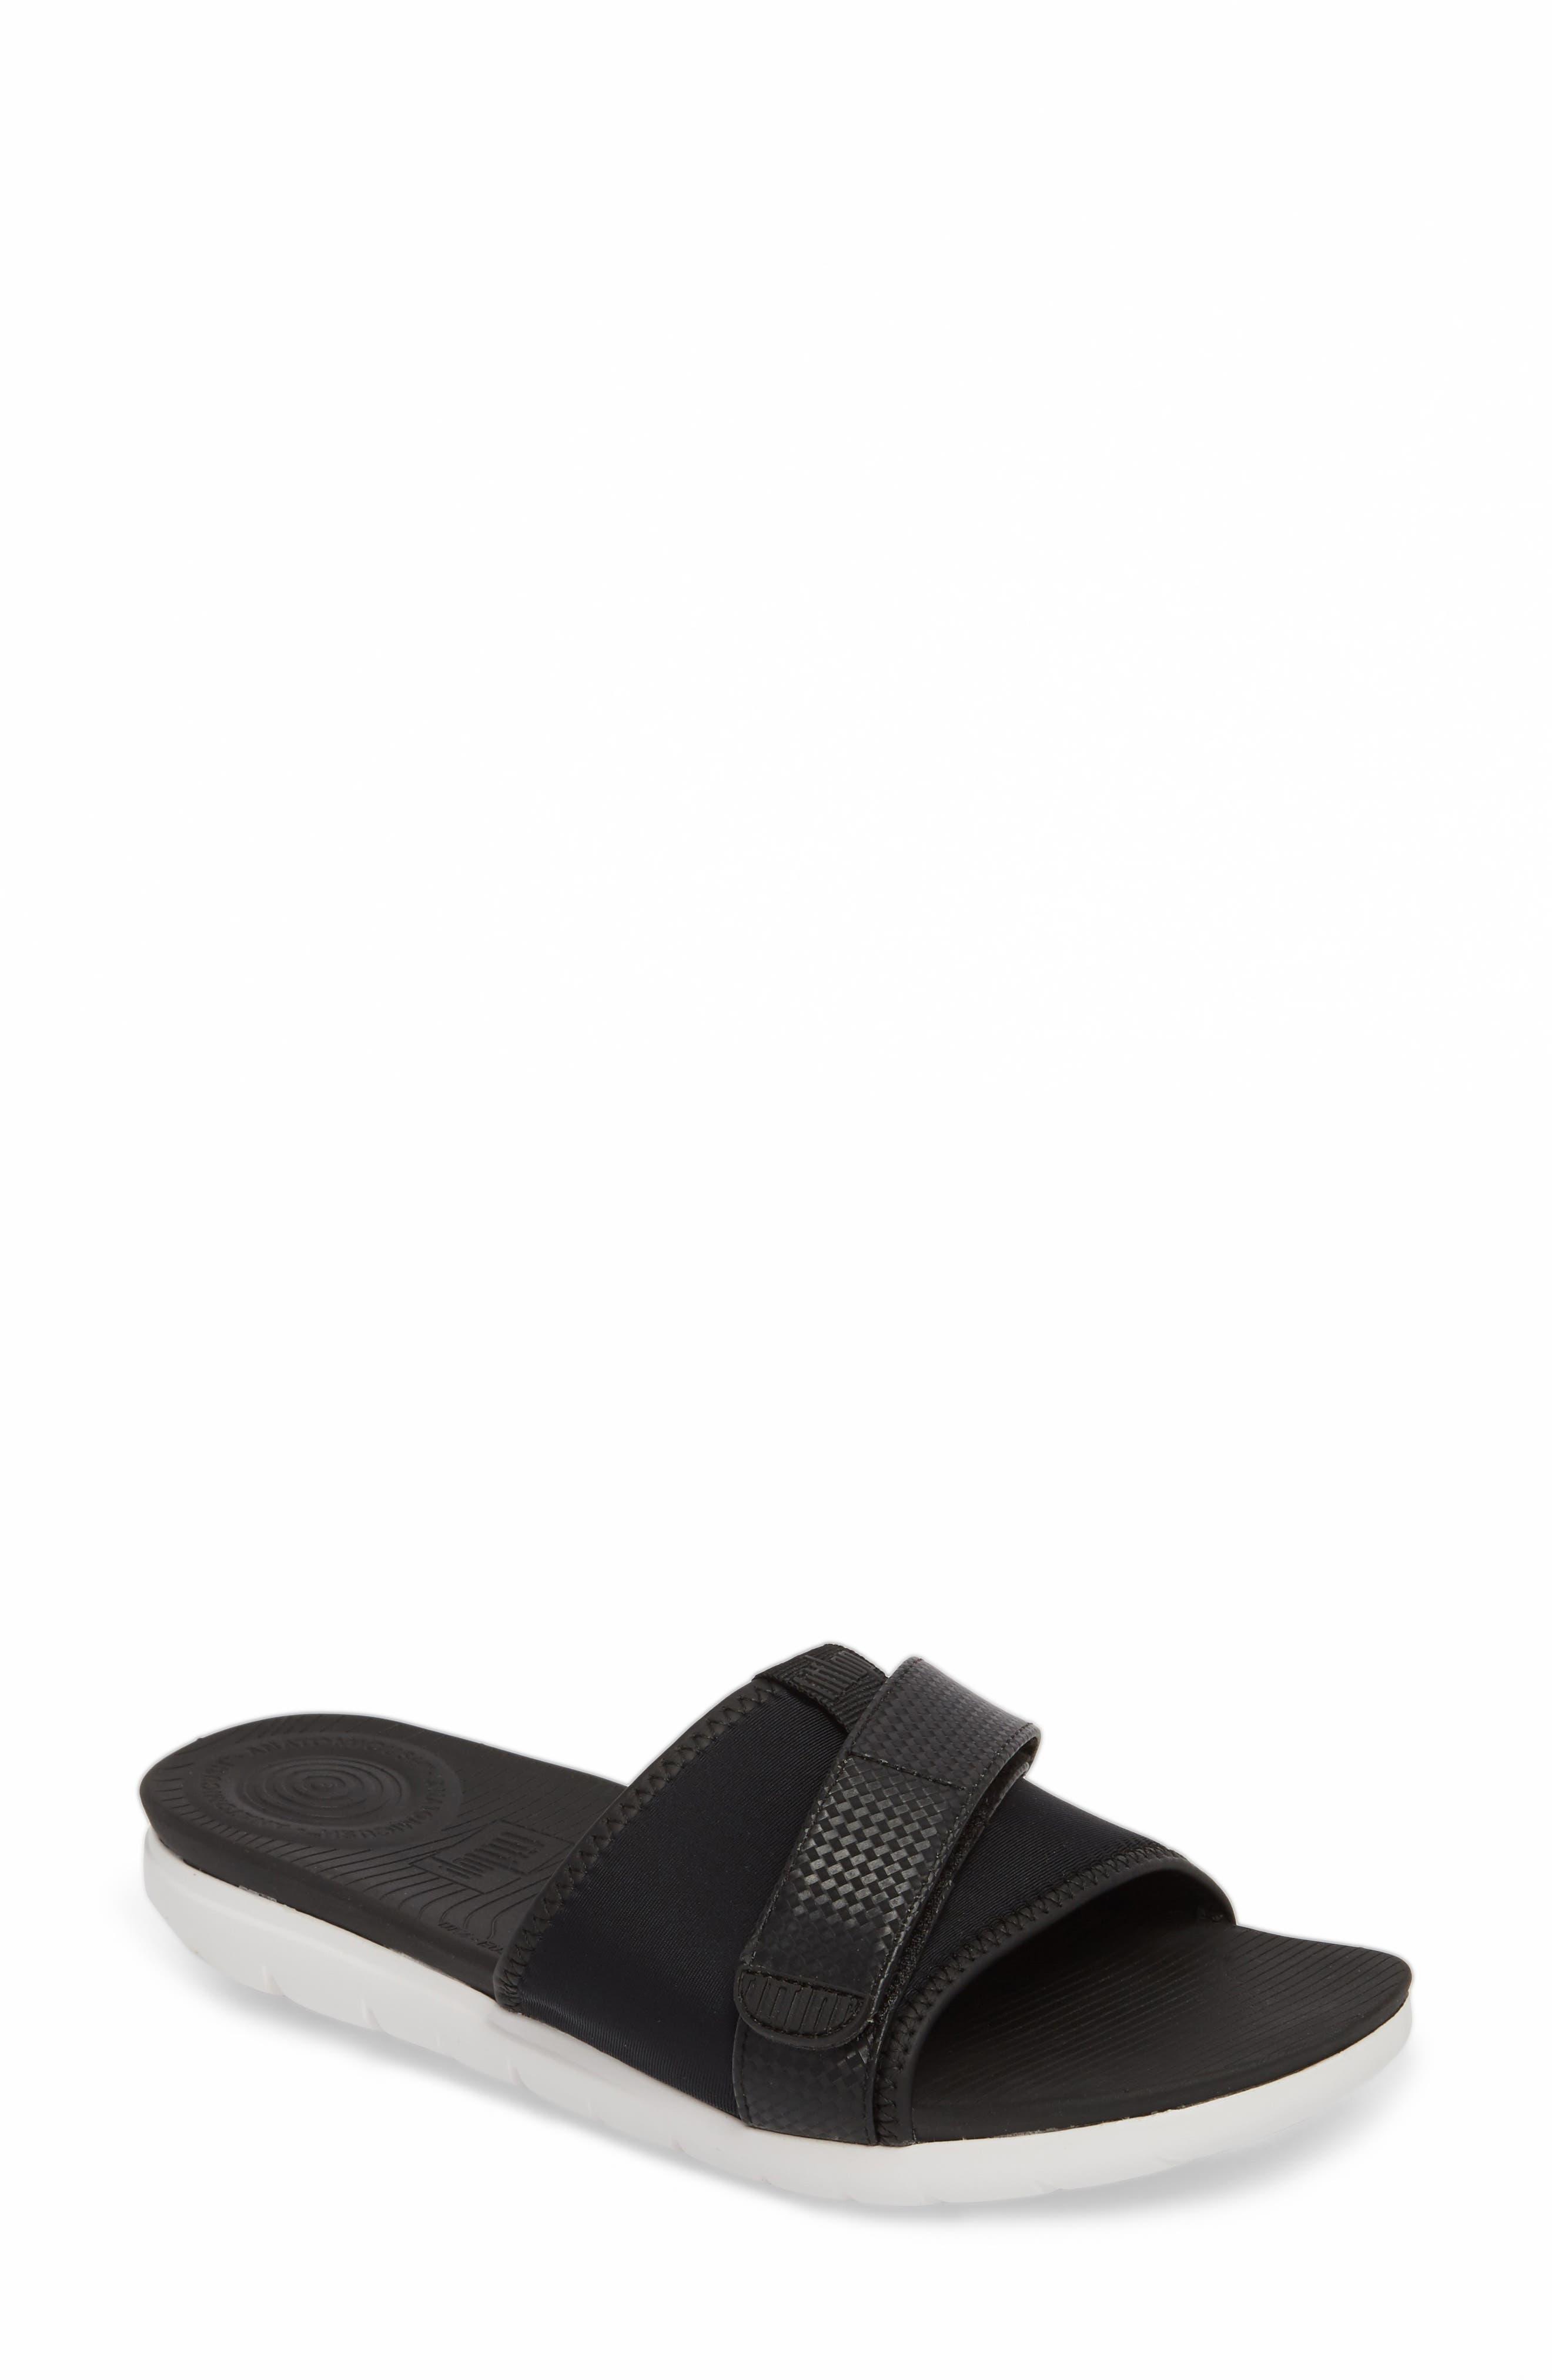 Neoflex Slide Sandal,                             Main thumbnail 1, color,                             BLACK FABRIC